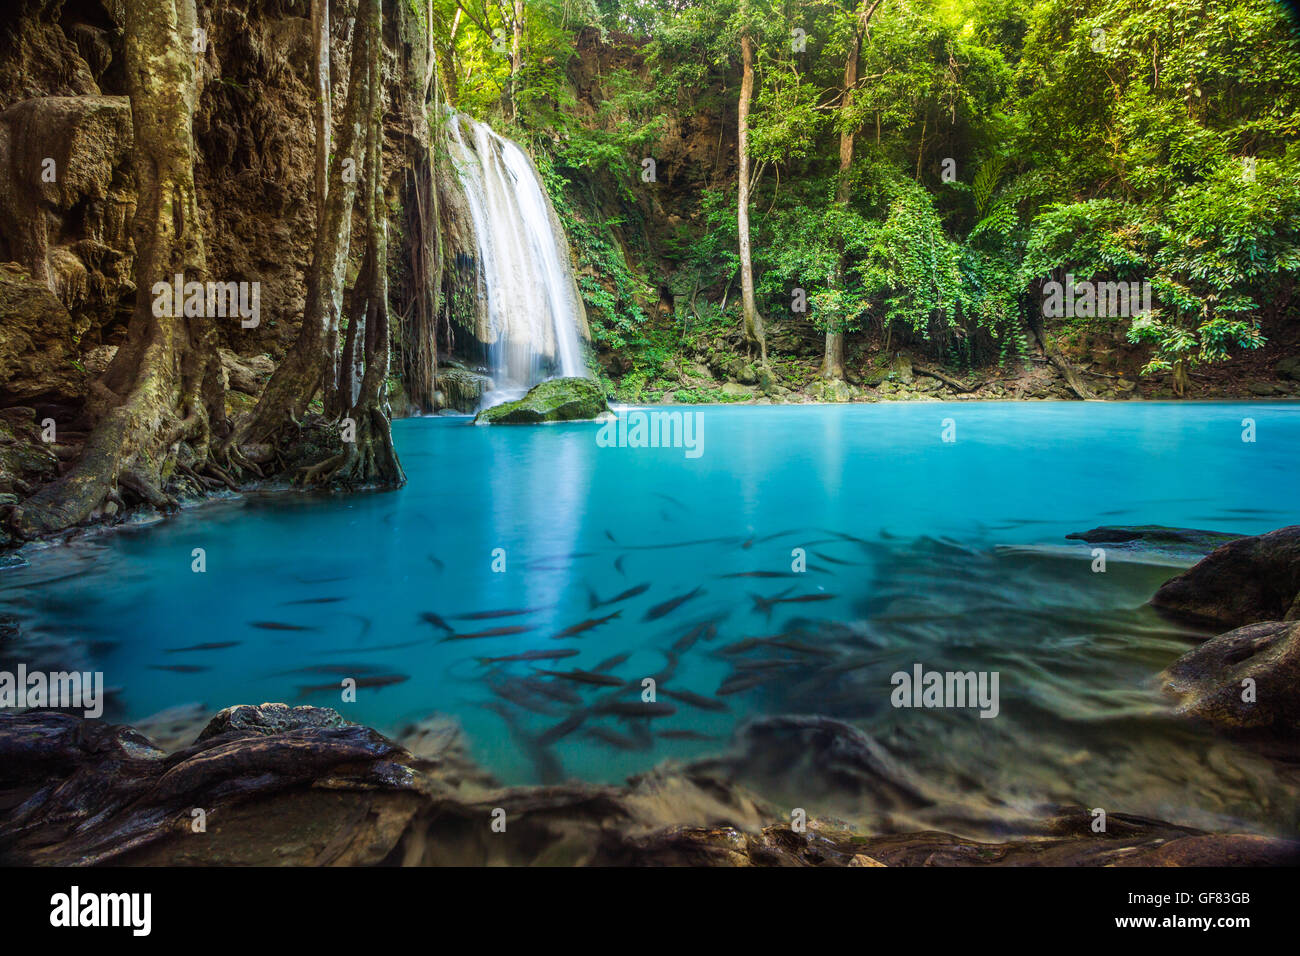 Erawan waterfall environment with big tree and emerald water in Kanchanaburi, Thailand - Stock Image